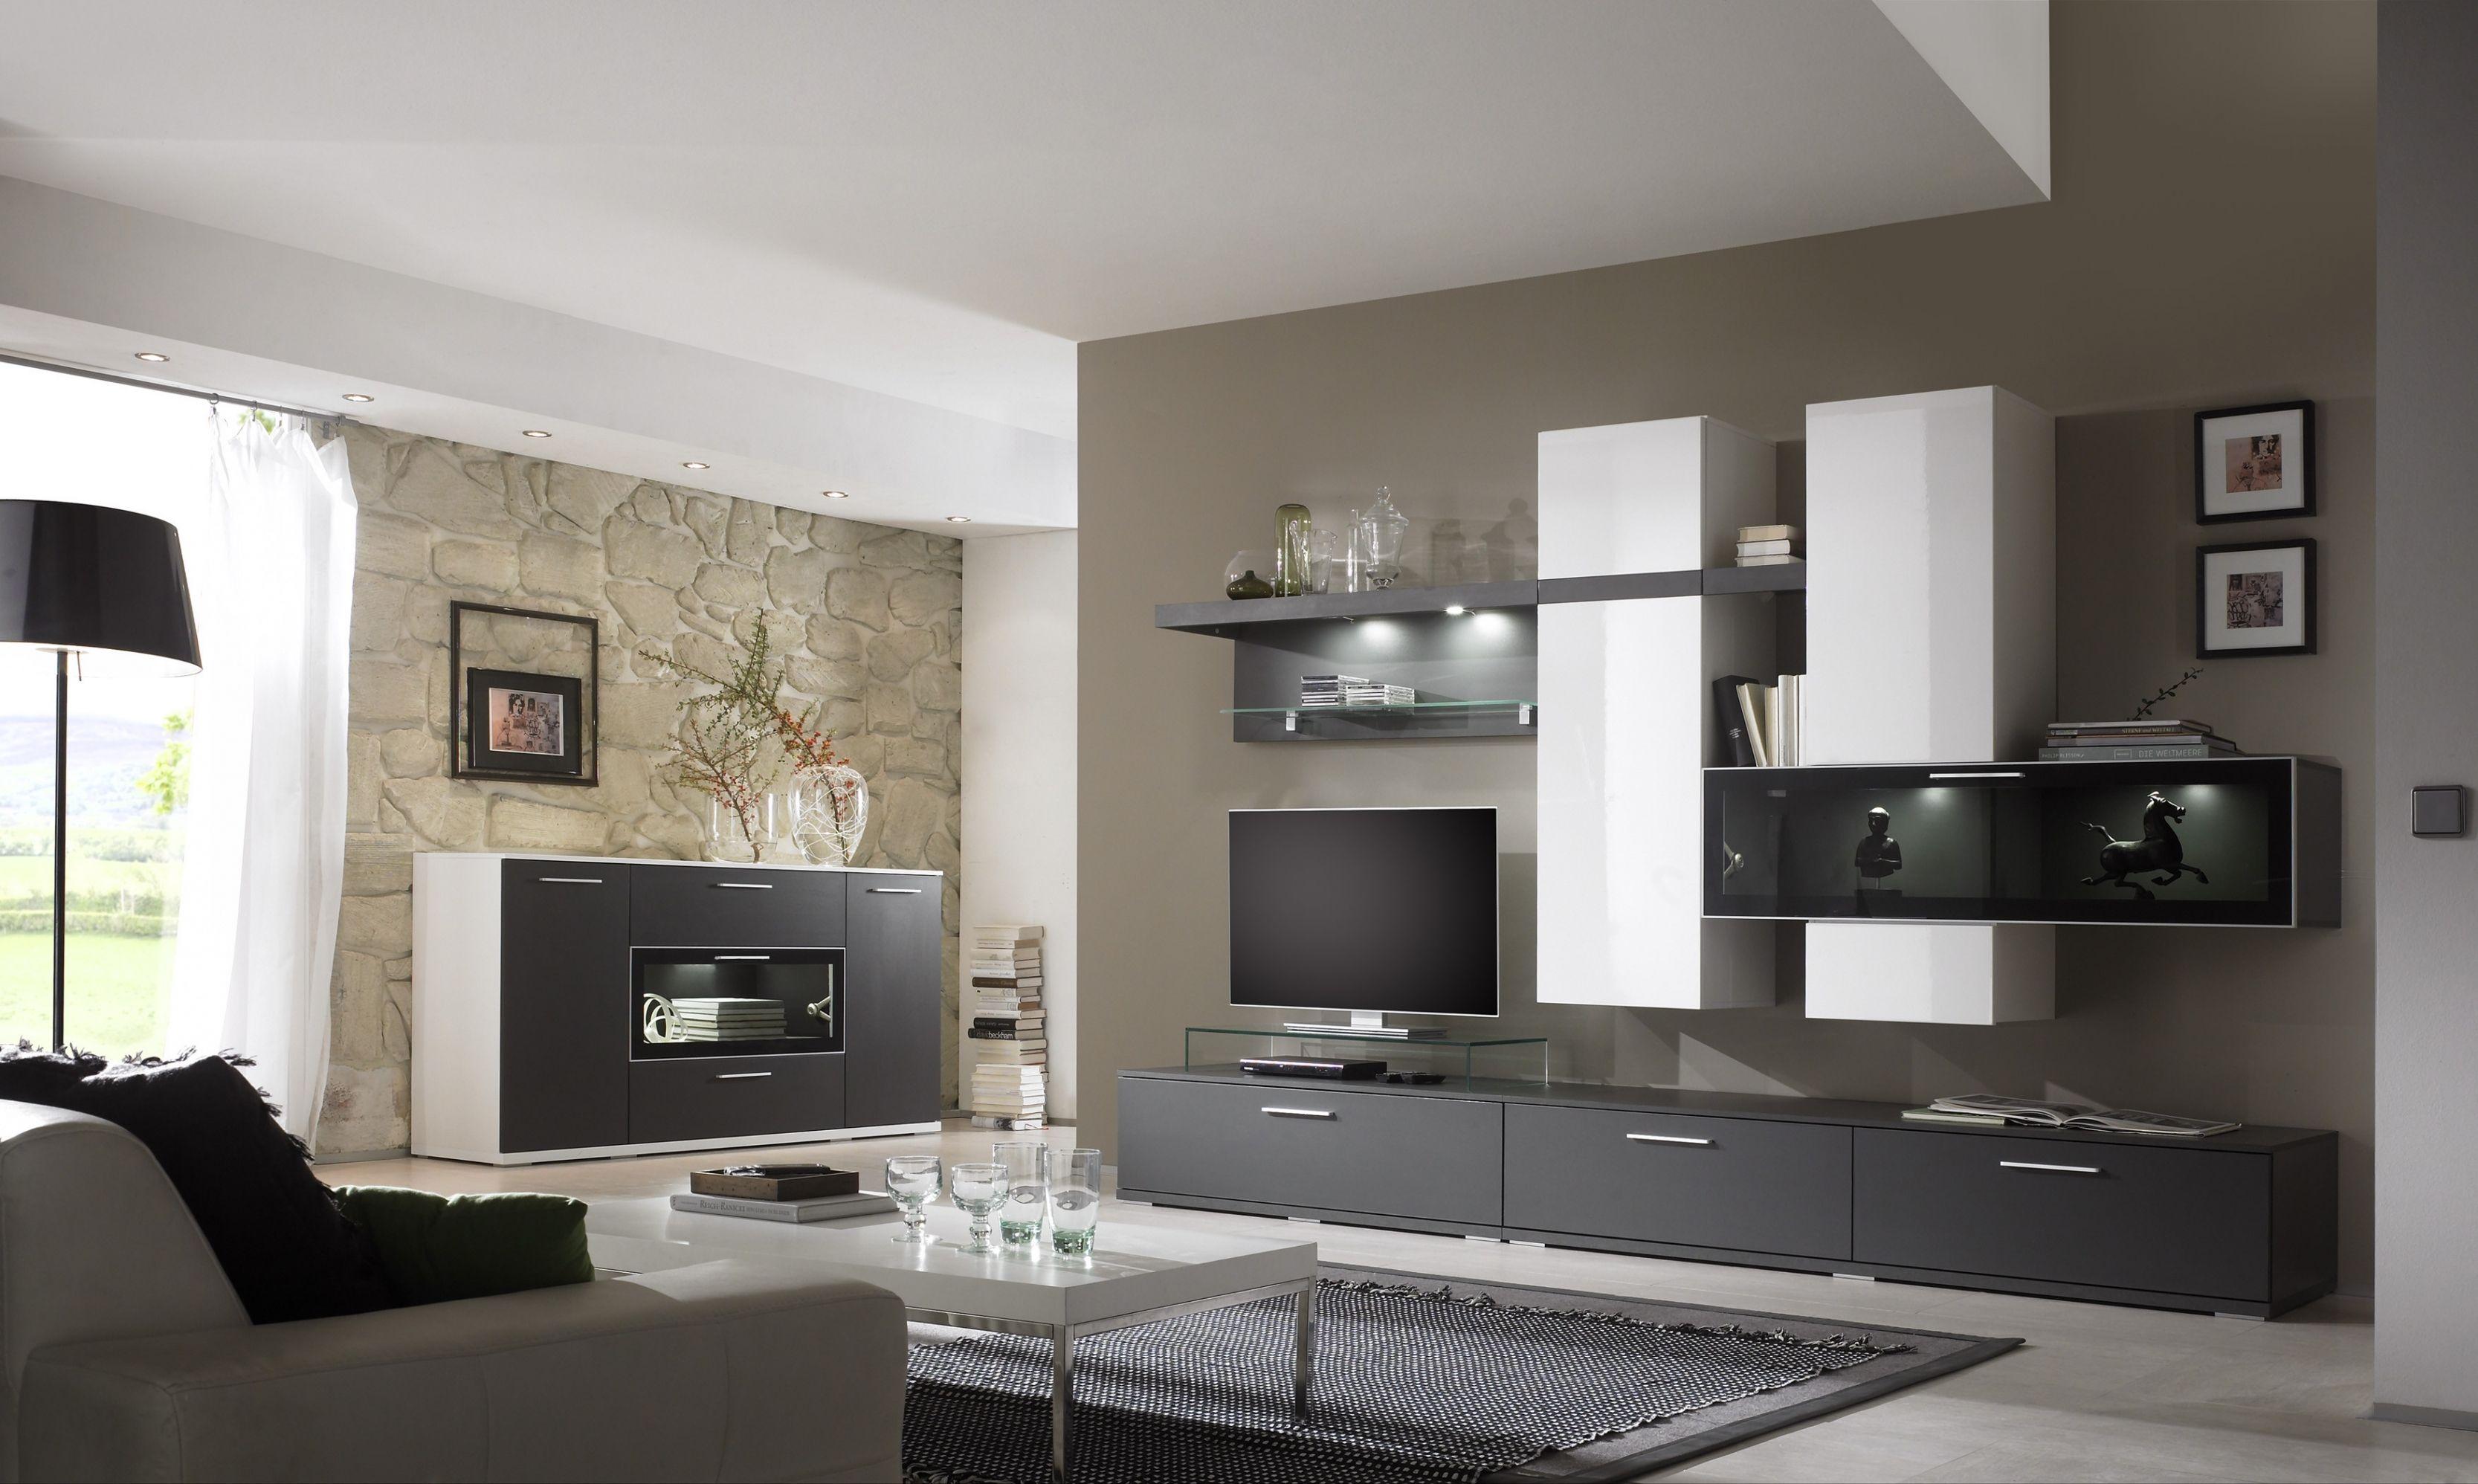 Wohnzimmer Ideen Grau Braun - homeautodesign.com -